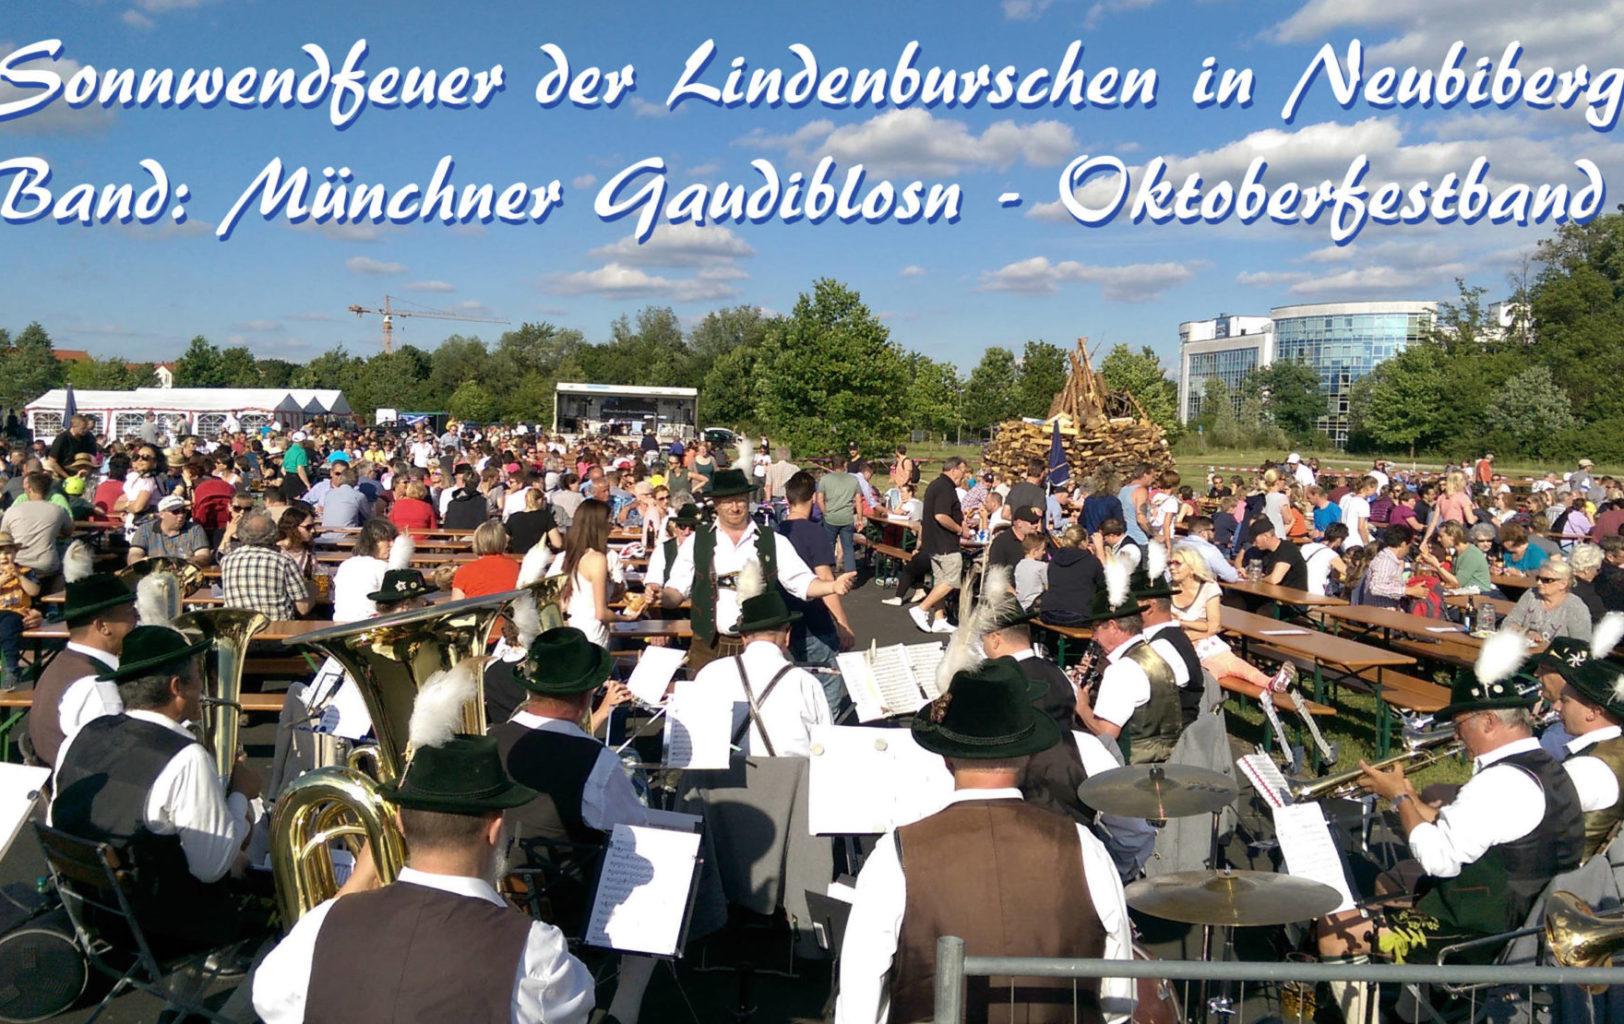 Sonnwendfeier Neubiberg Oktoberfestband Baudiblosn